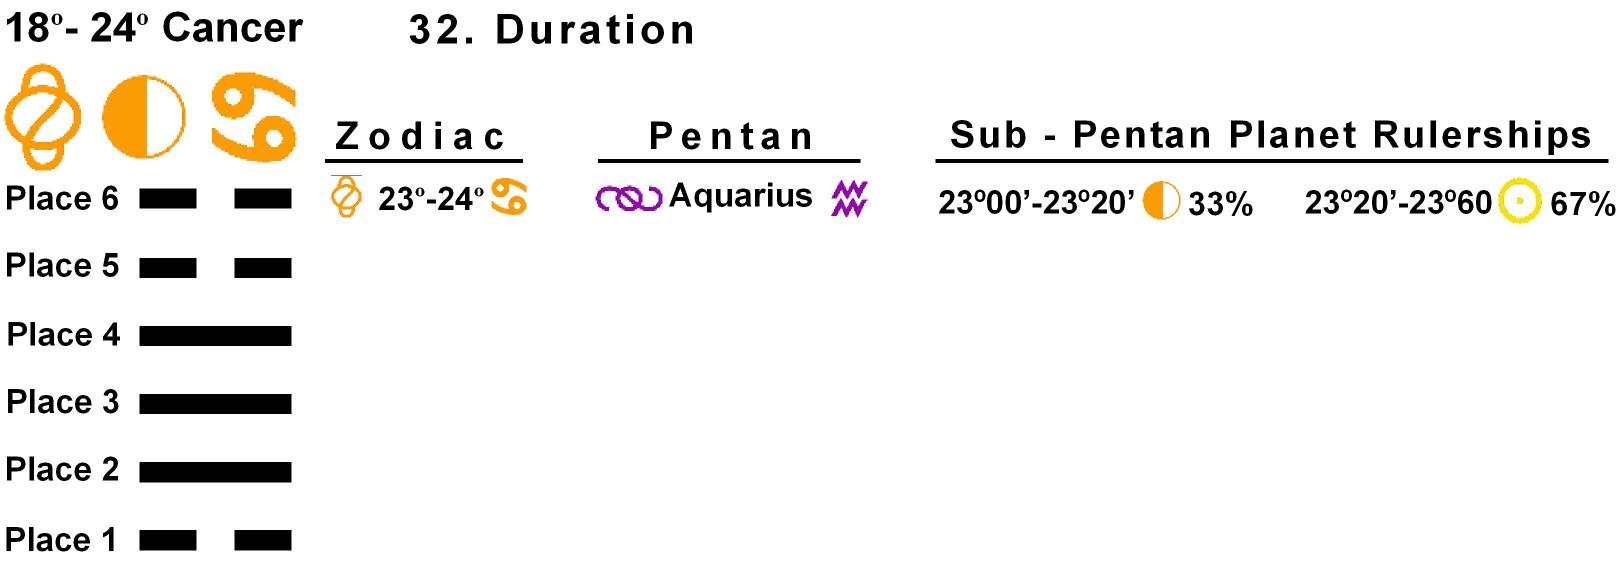 Pent-lines-04CA 23-24 Hx-32 Duration